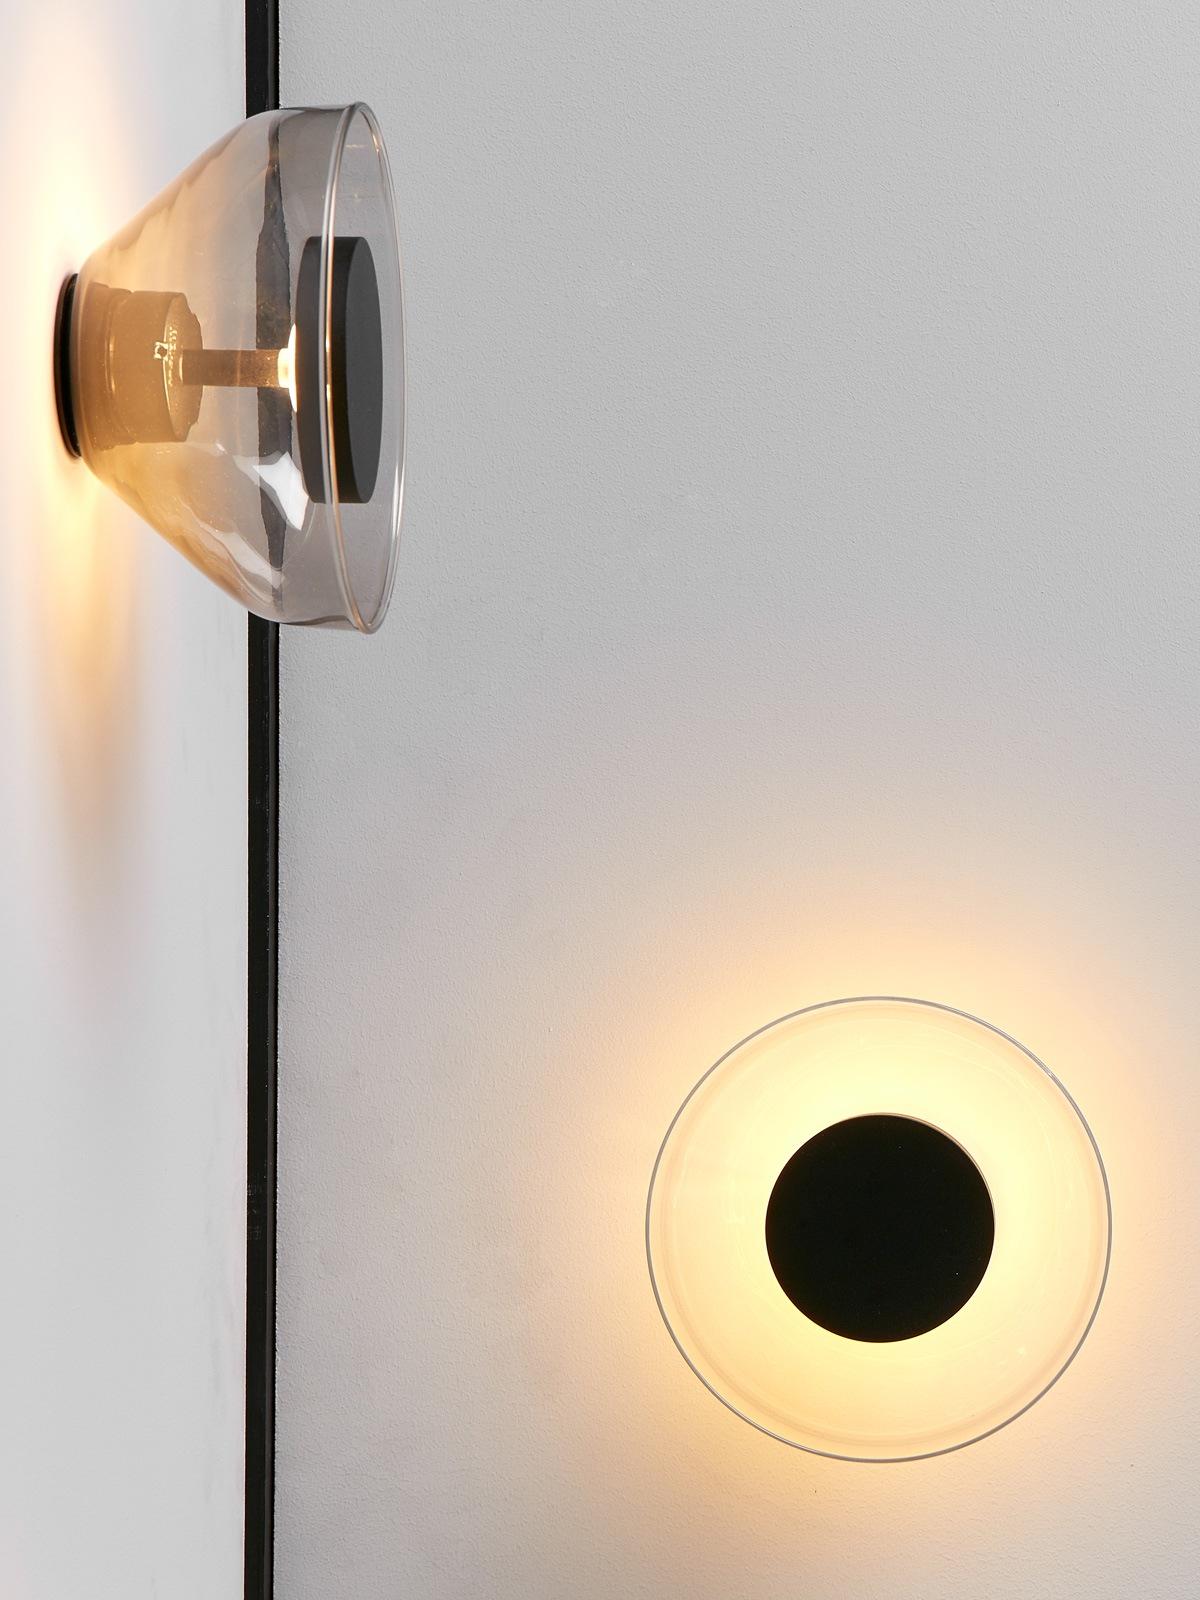 Aura Wandleuchte Morset mundgeblasenes Glas LED dimmbar